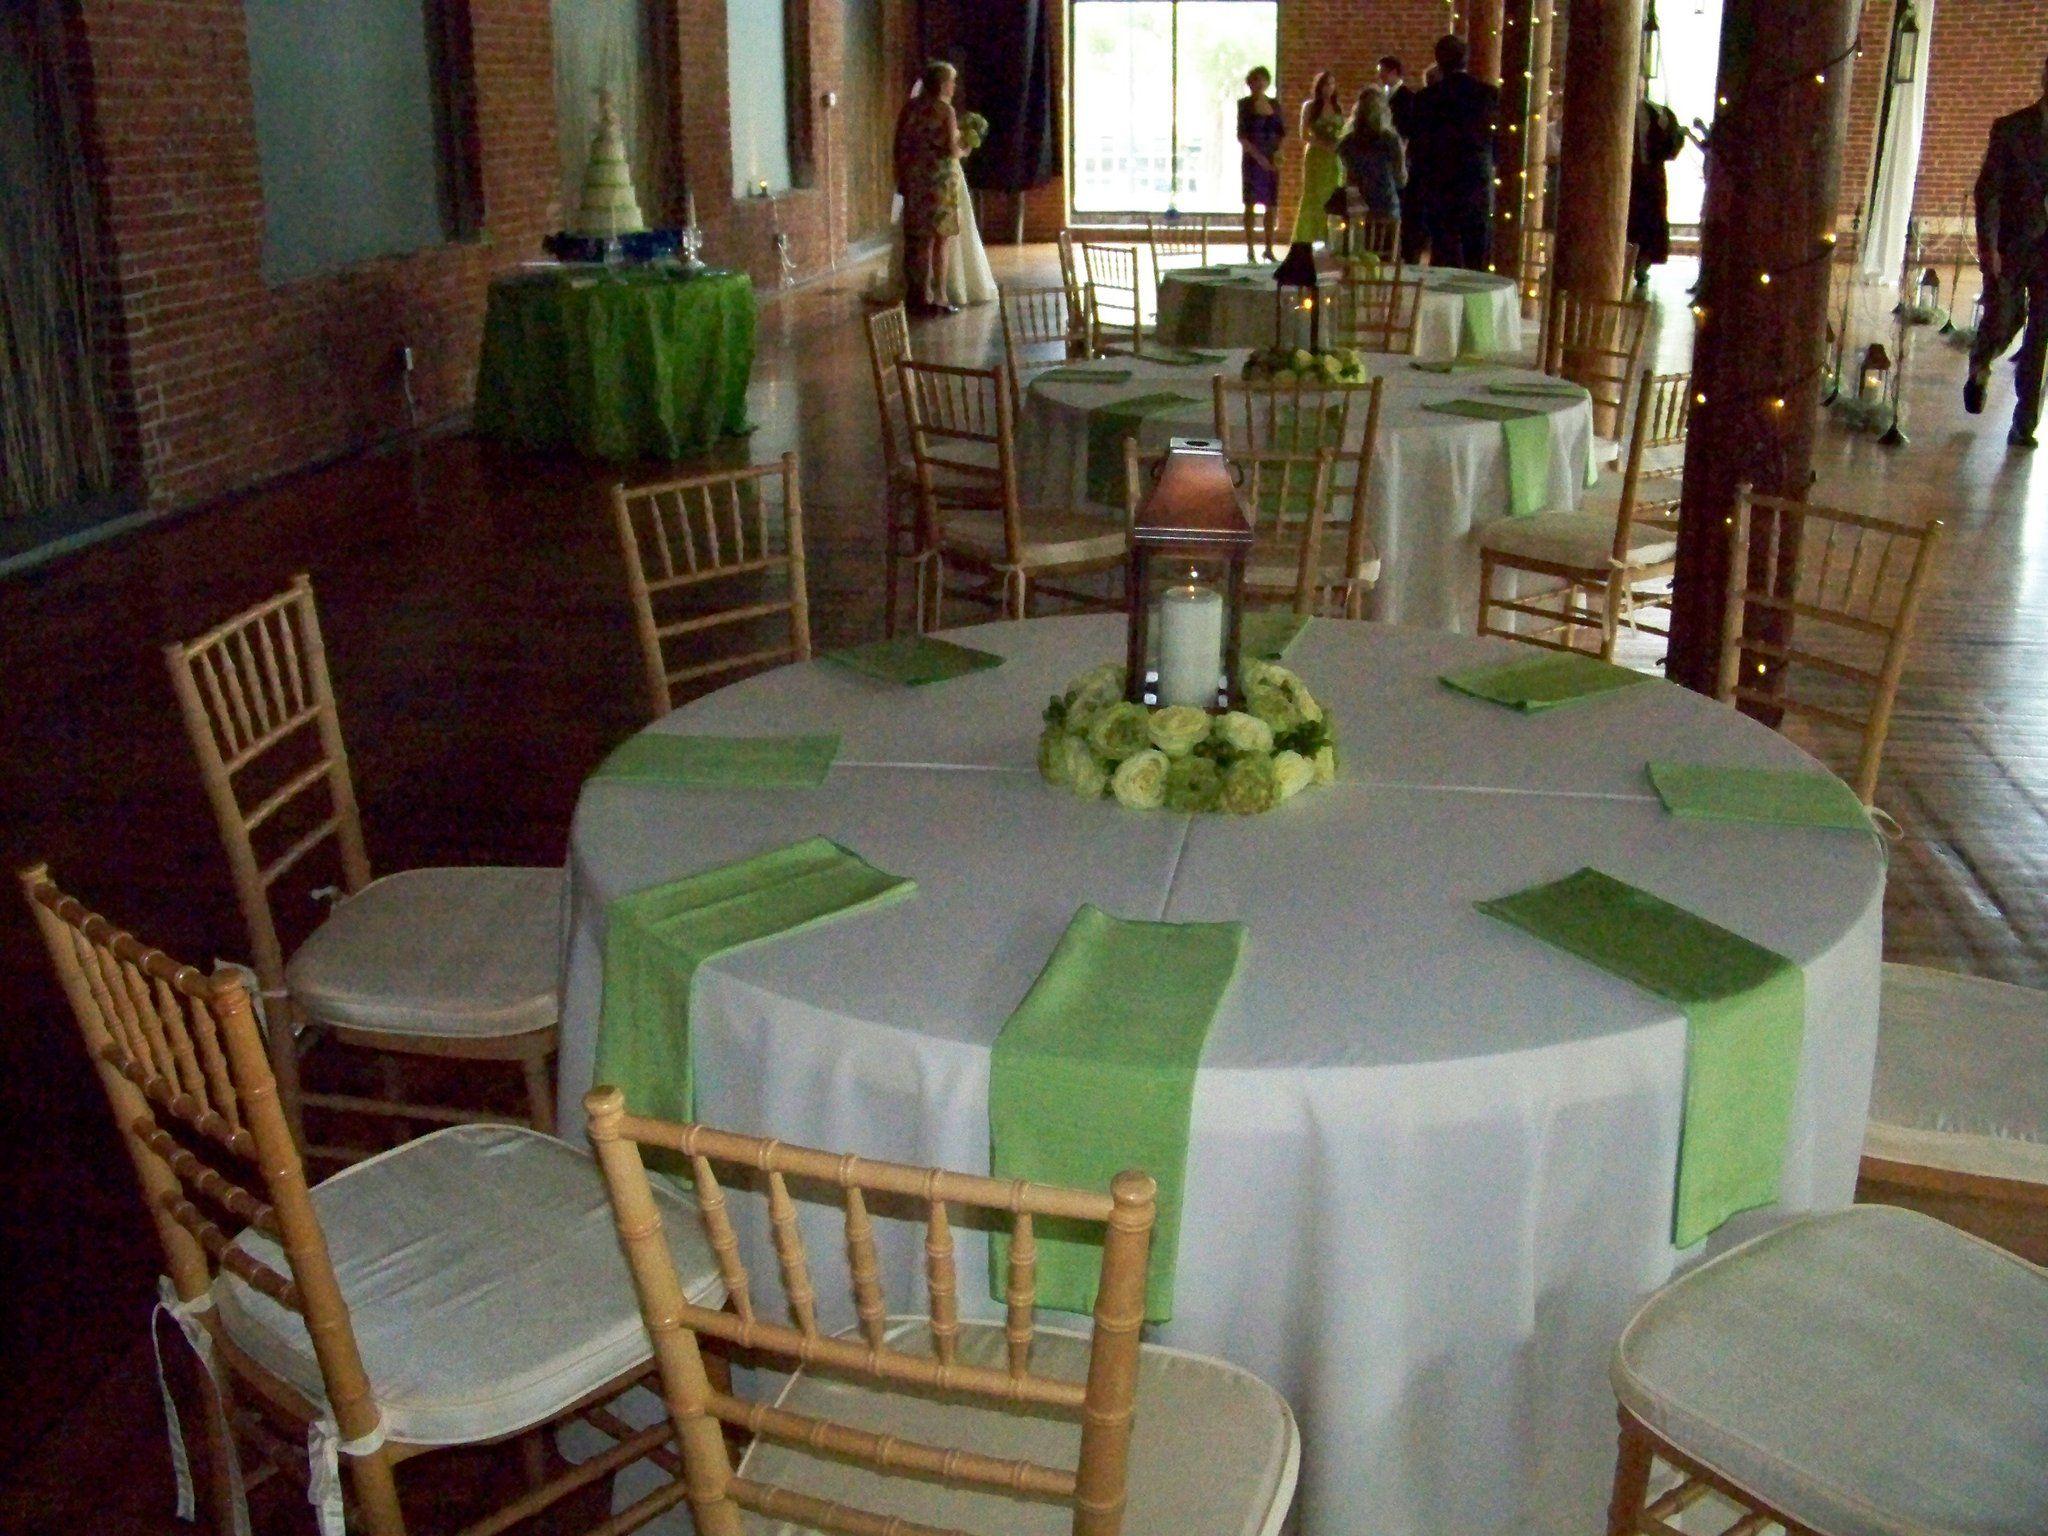 Wedding ideas with lanterns  Lantern centerpiece and cloth napkins  Wedding Idea Stuff